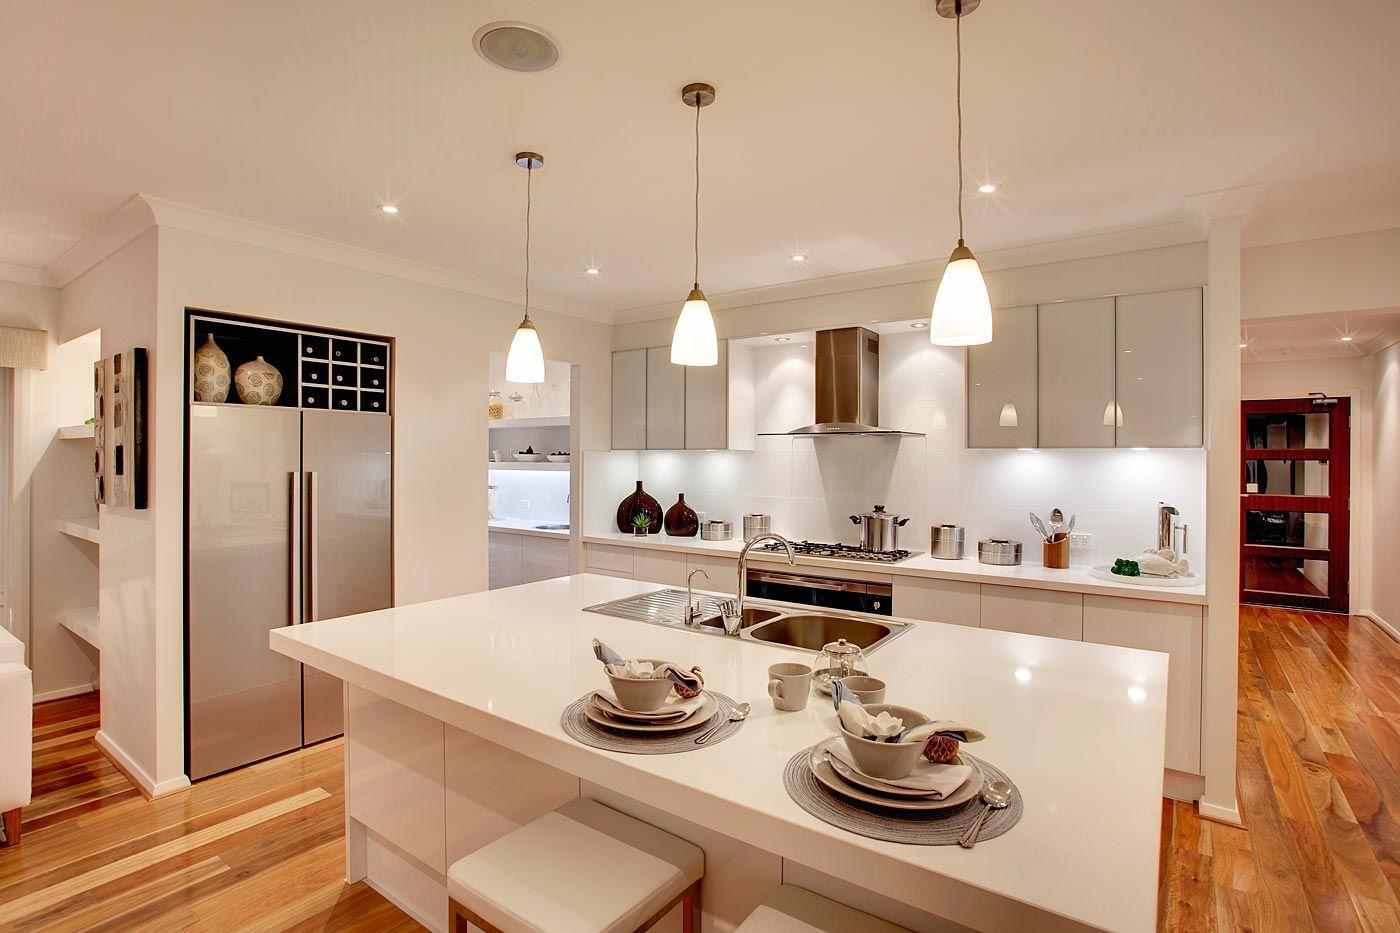 Avoca mcdonald jones homes kitchens pinterest for Mcdonald jones kitchen designs